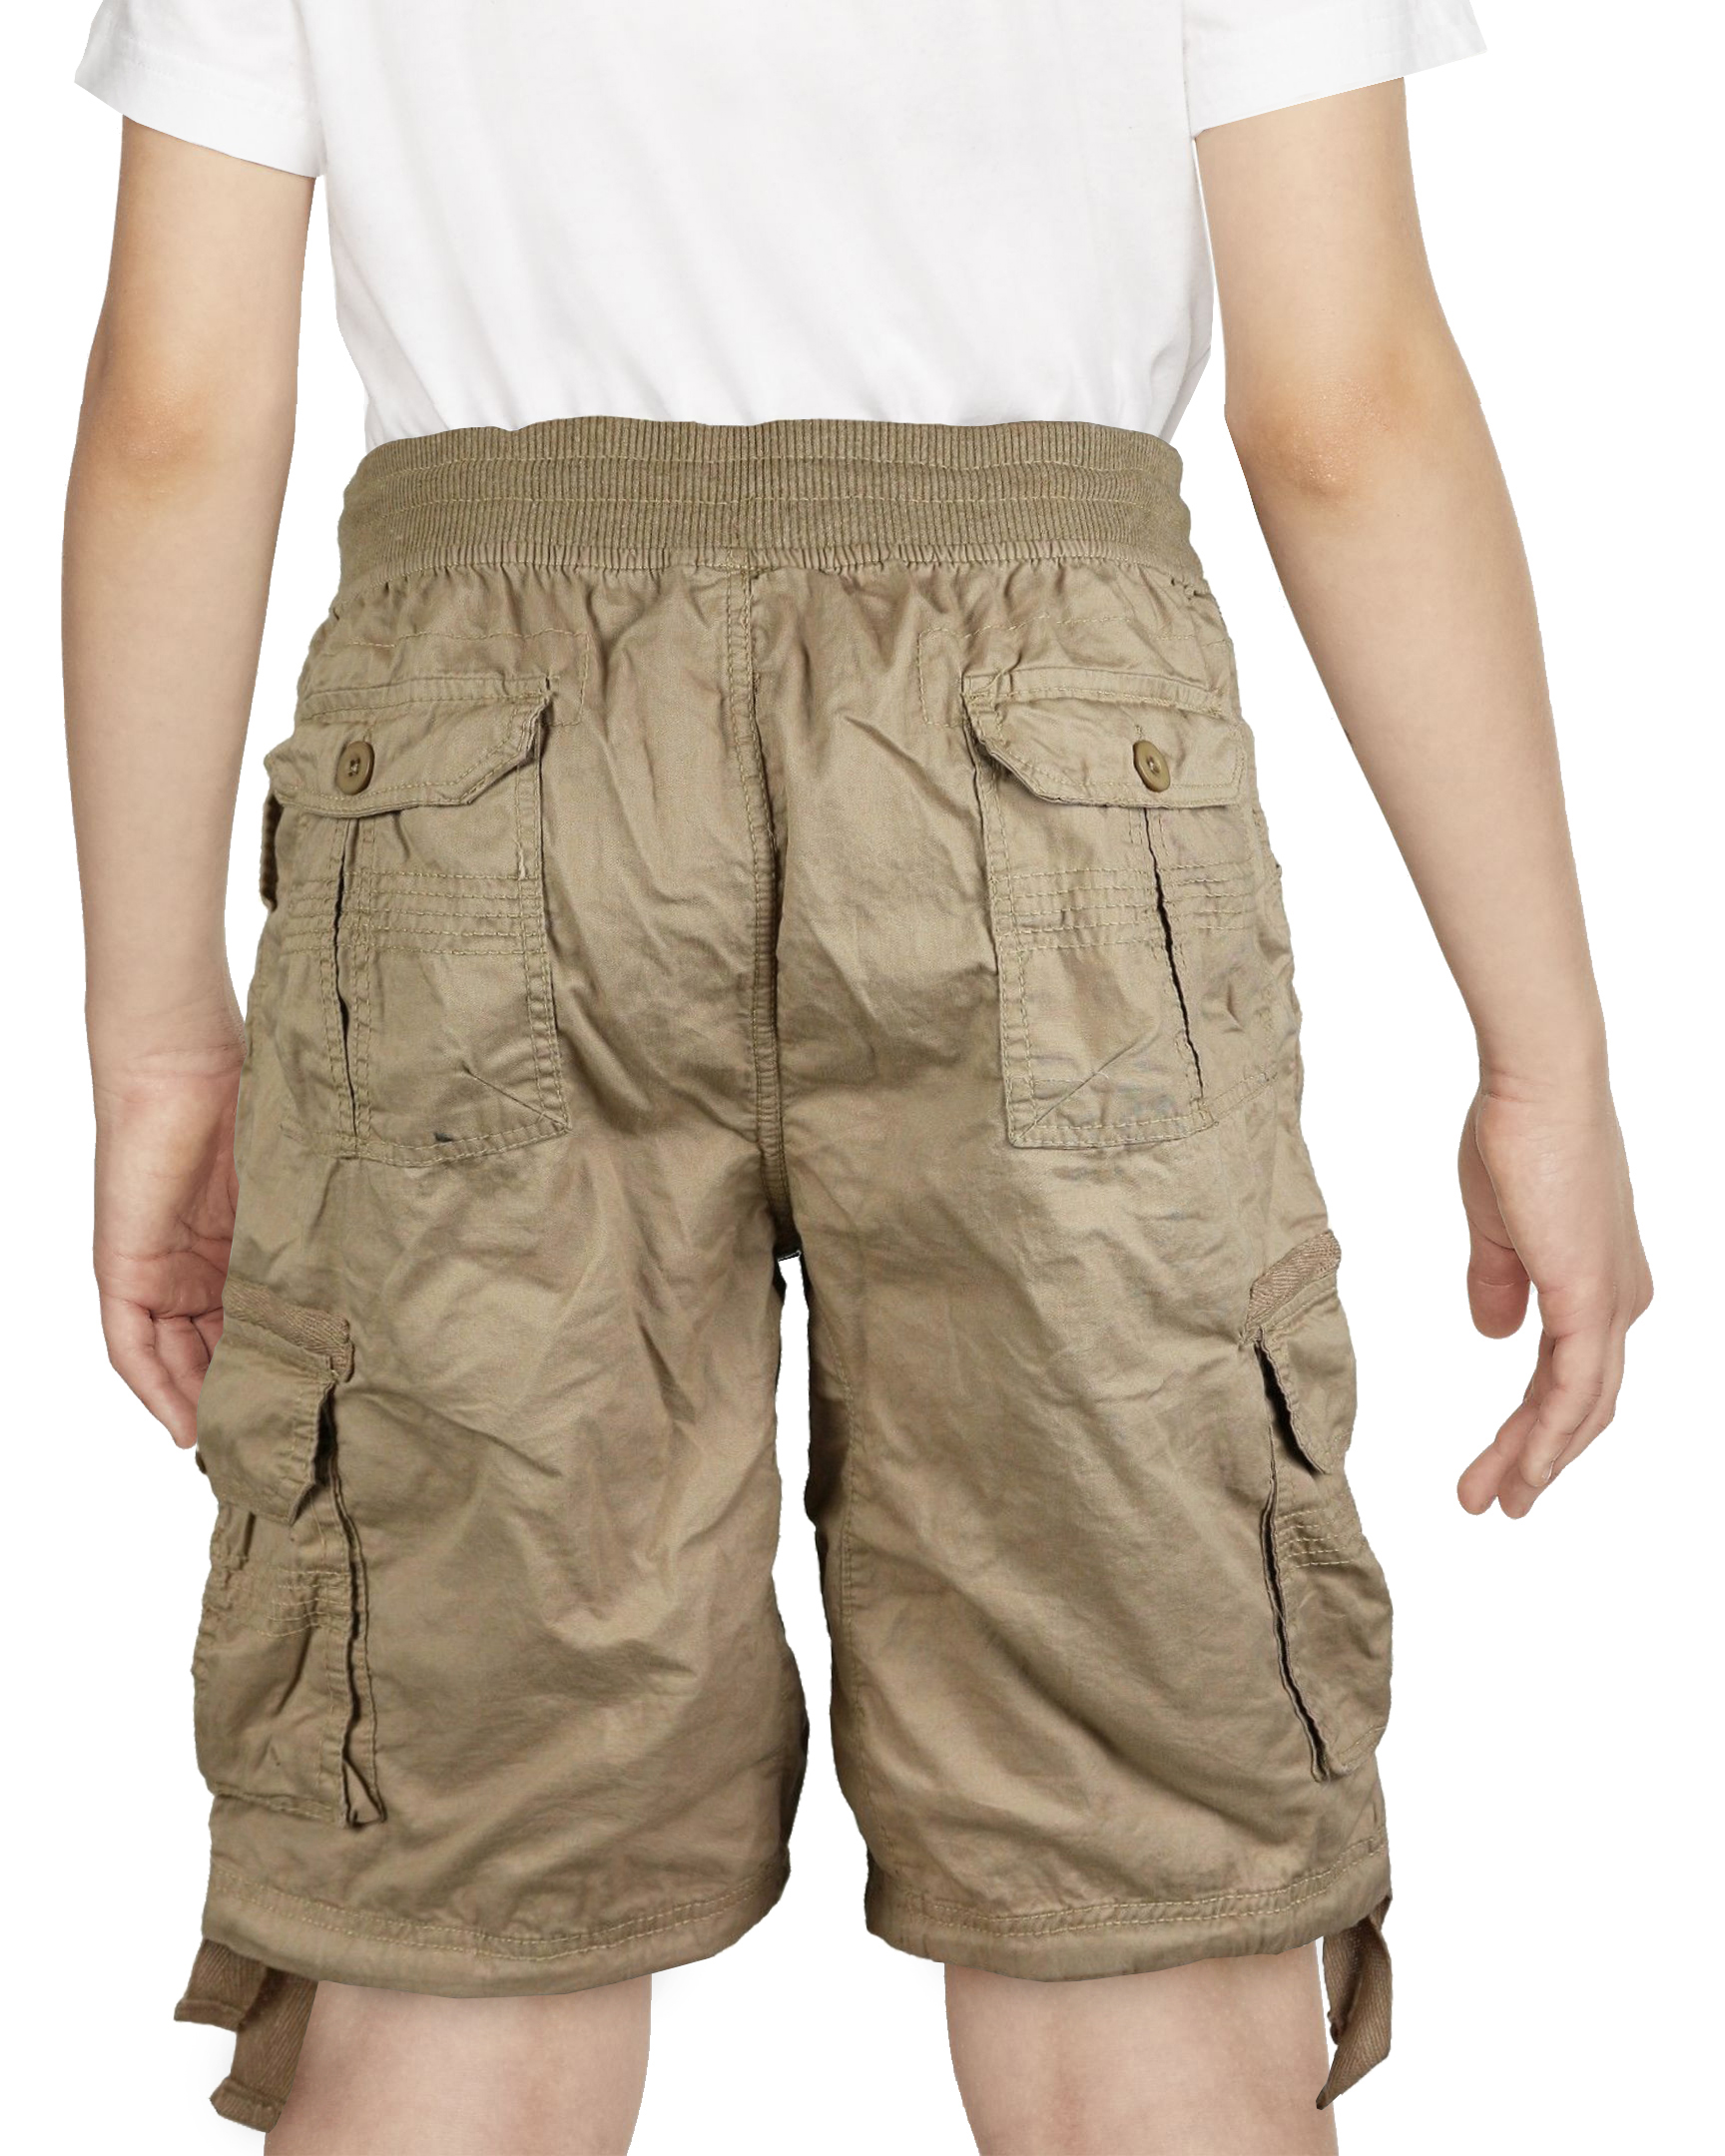 30 Day Guarantee Smash for Toddler and Boys 4-14 100/% Cotton Cargo Shorts